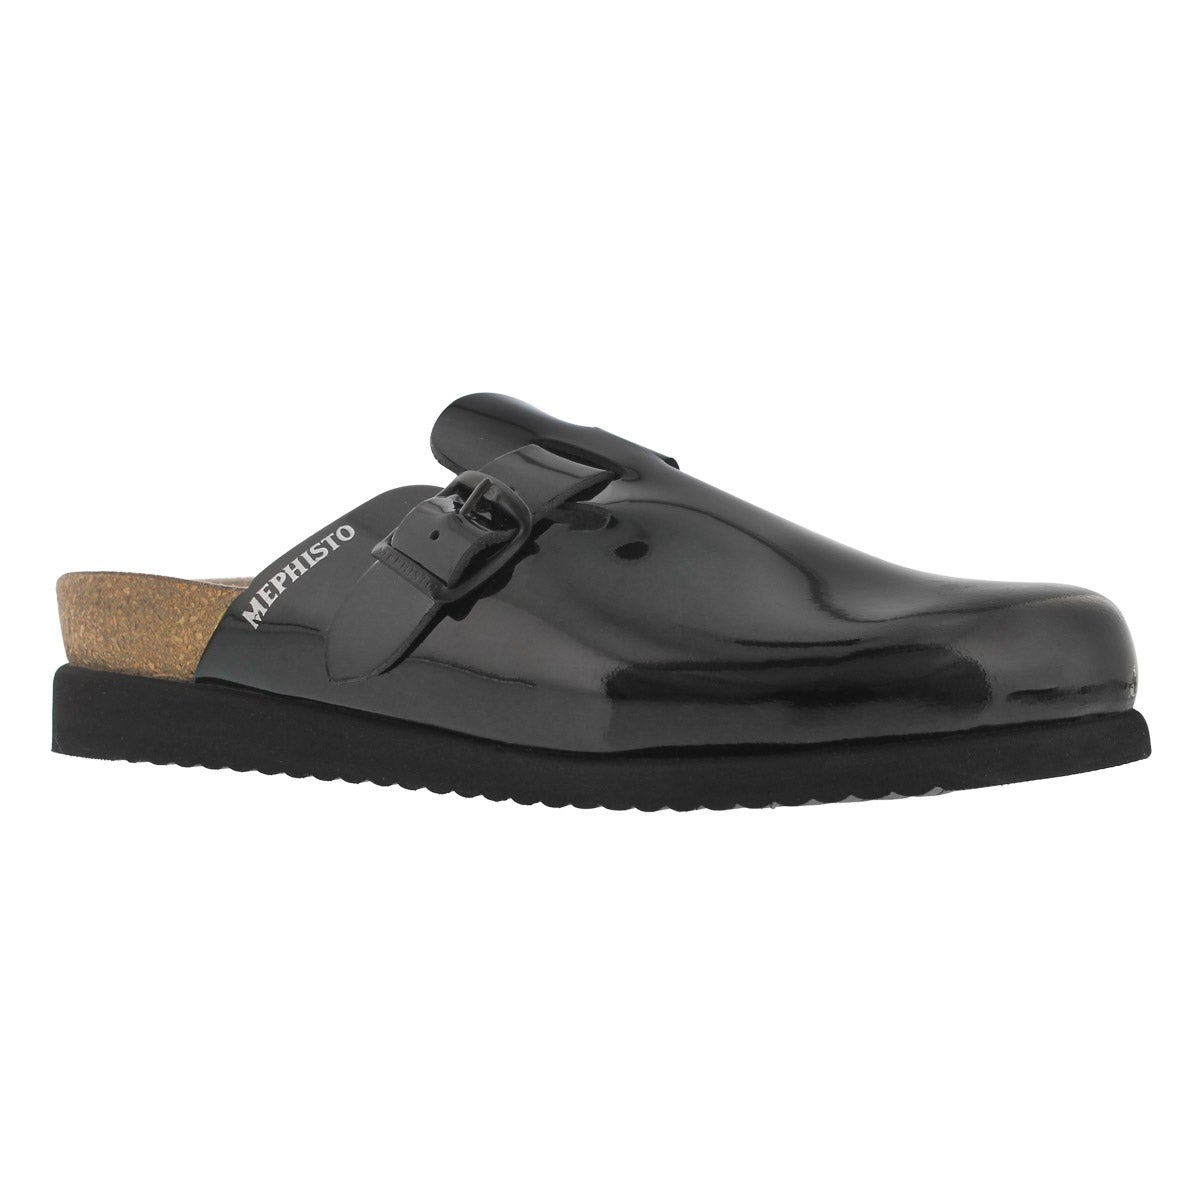 Women's HALINA black patent cork footbed clogs